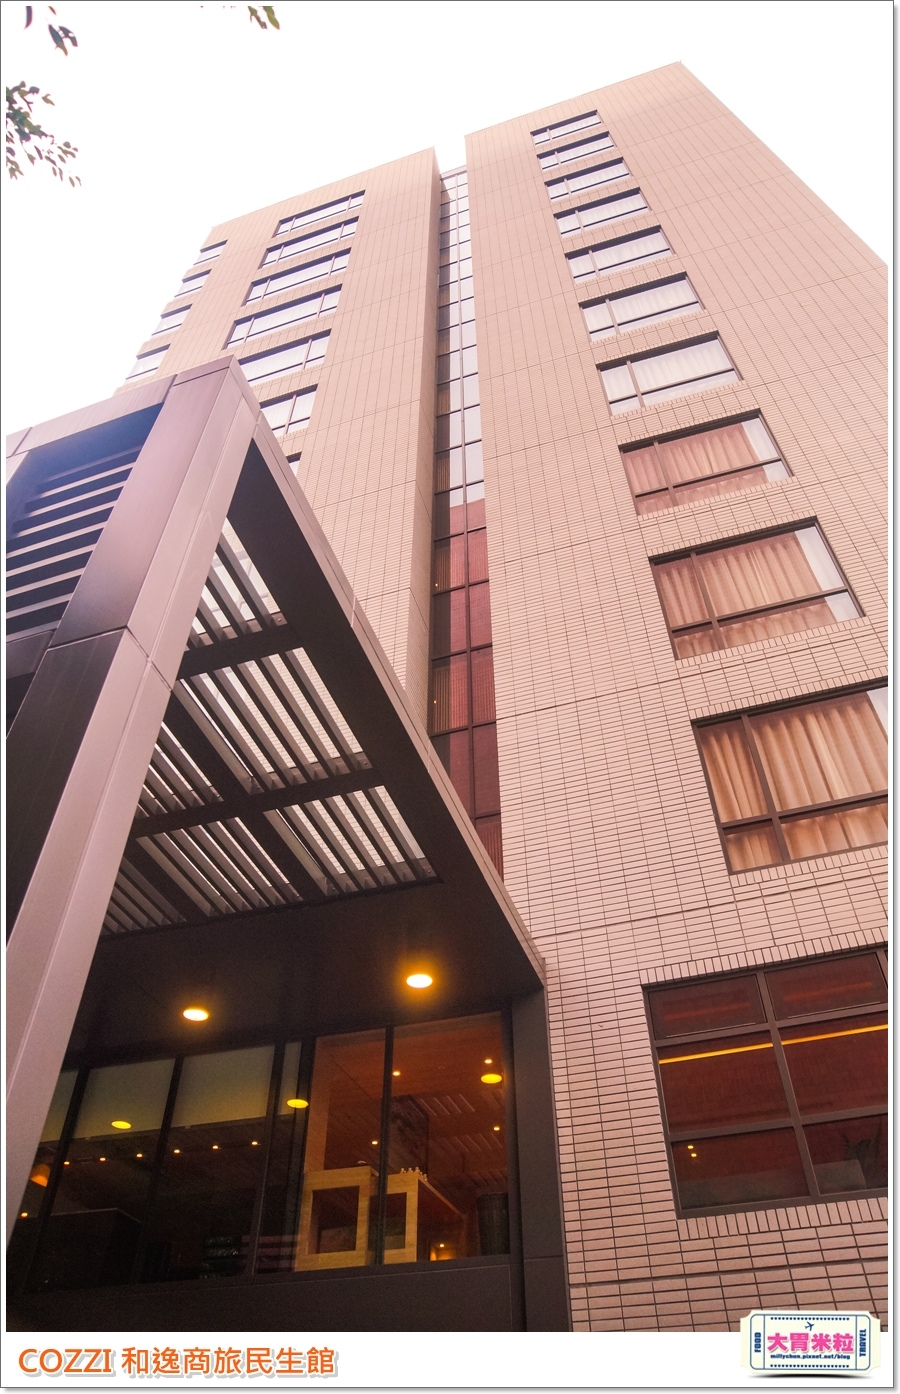 COZZI 和逸商旅民生館0026.jpg